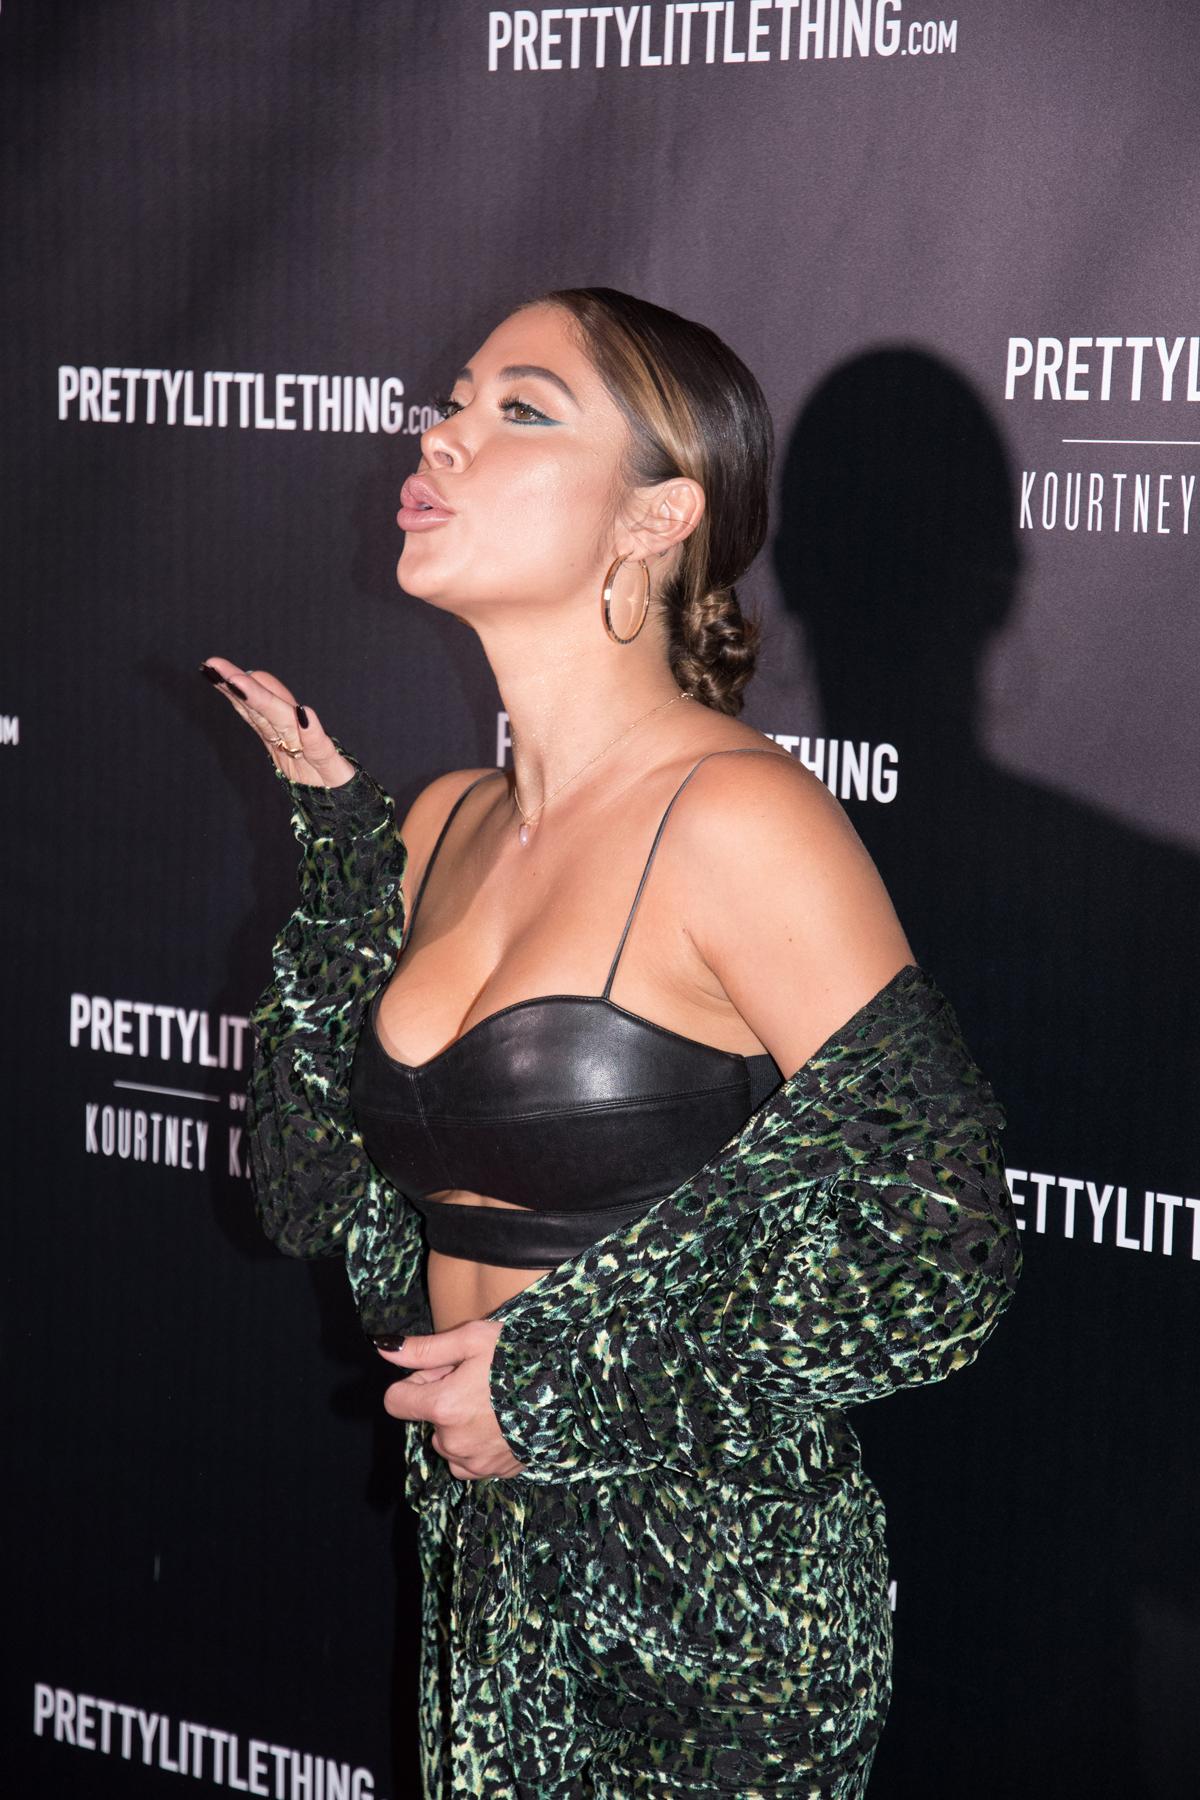 PrettyLittleThing PLT X Kourtney Kardashian Collection Celebrity Launch Party Arianny Celeste.jpg